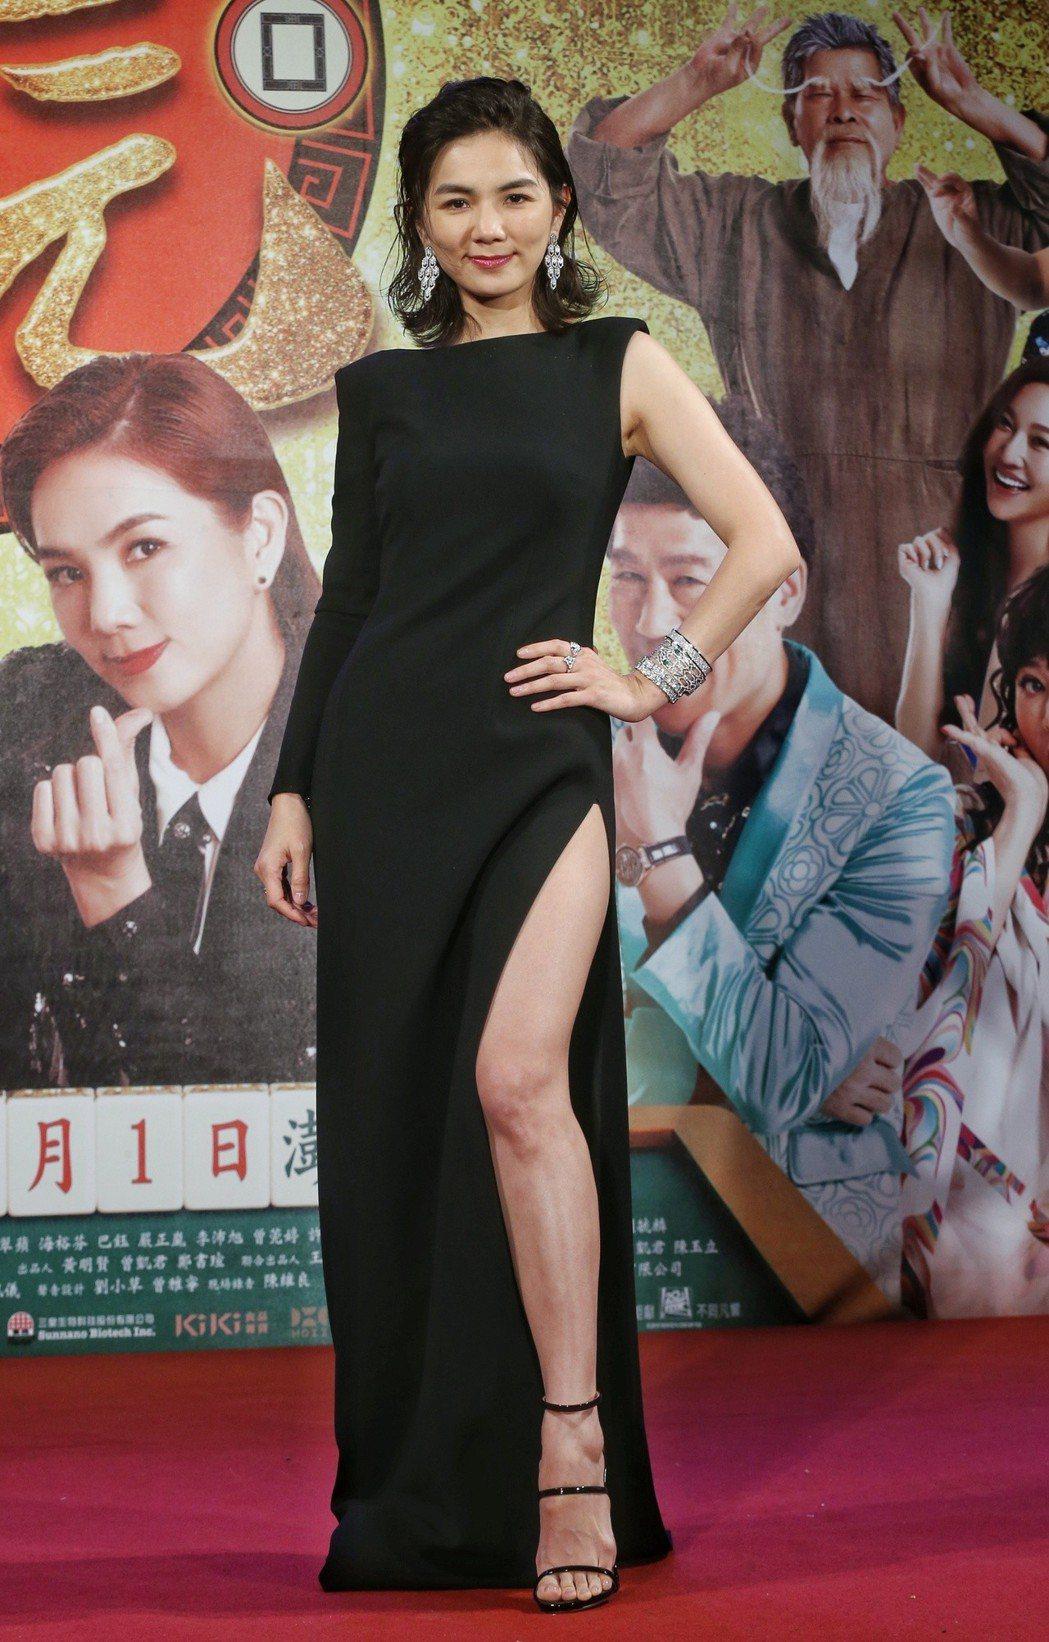 Ella出席電影首映。記者鄭清元/攝影